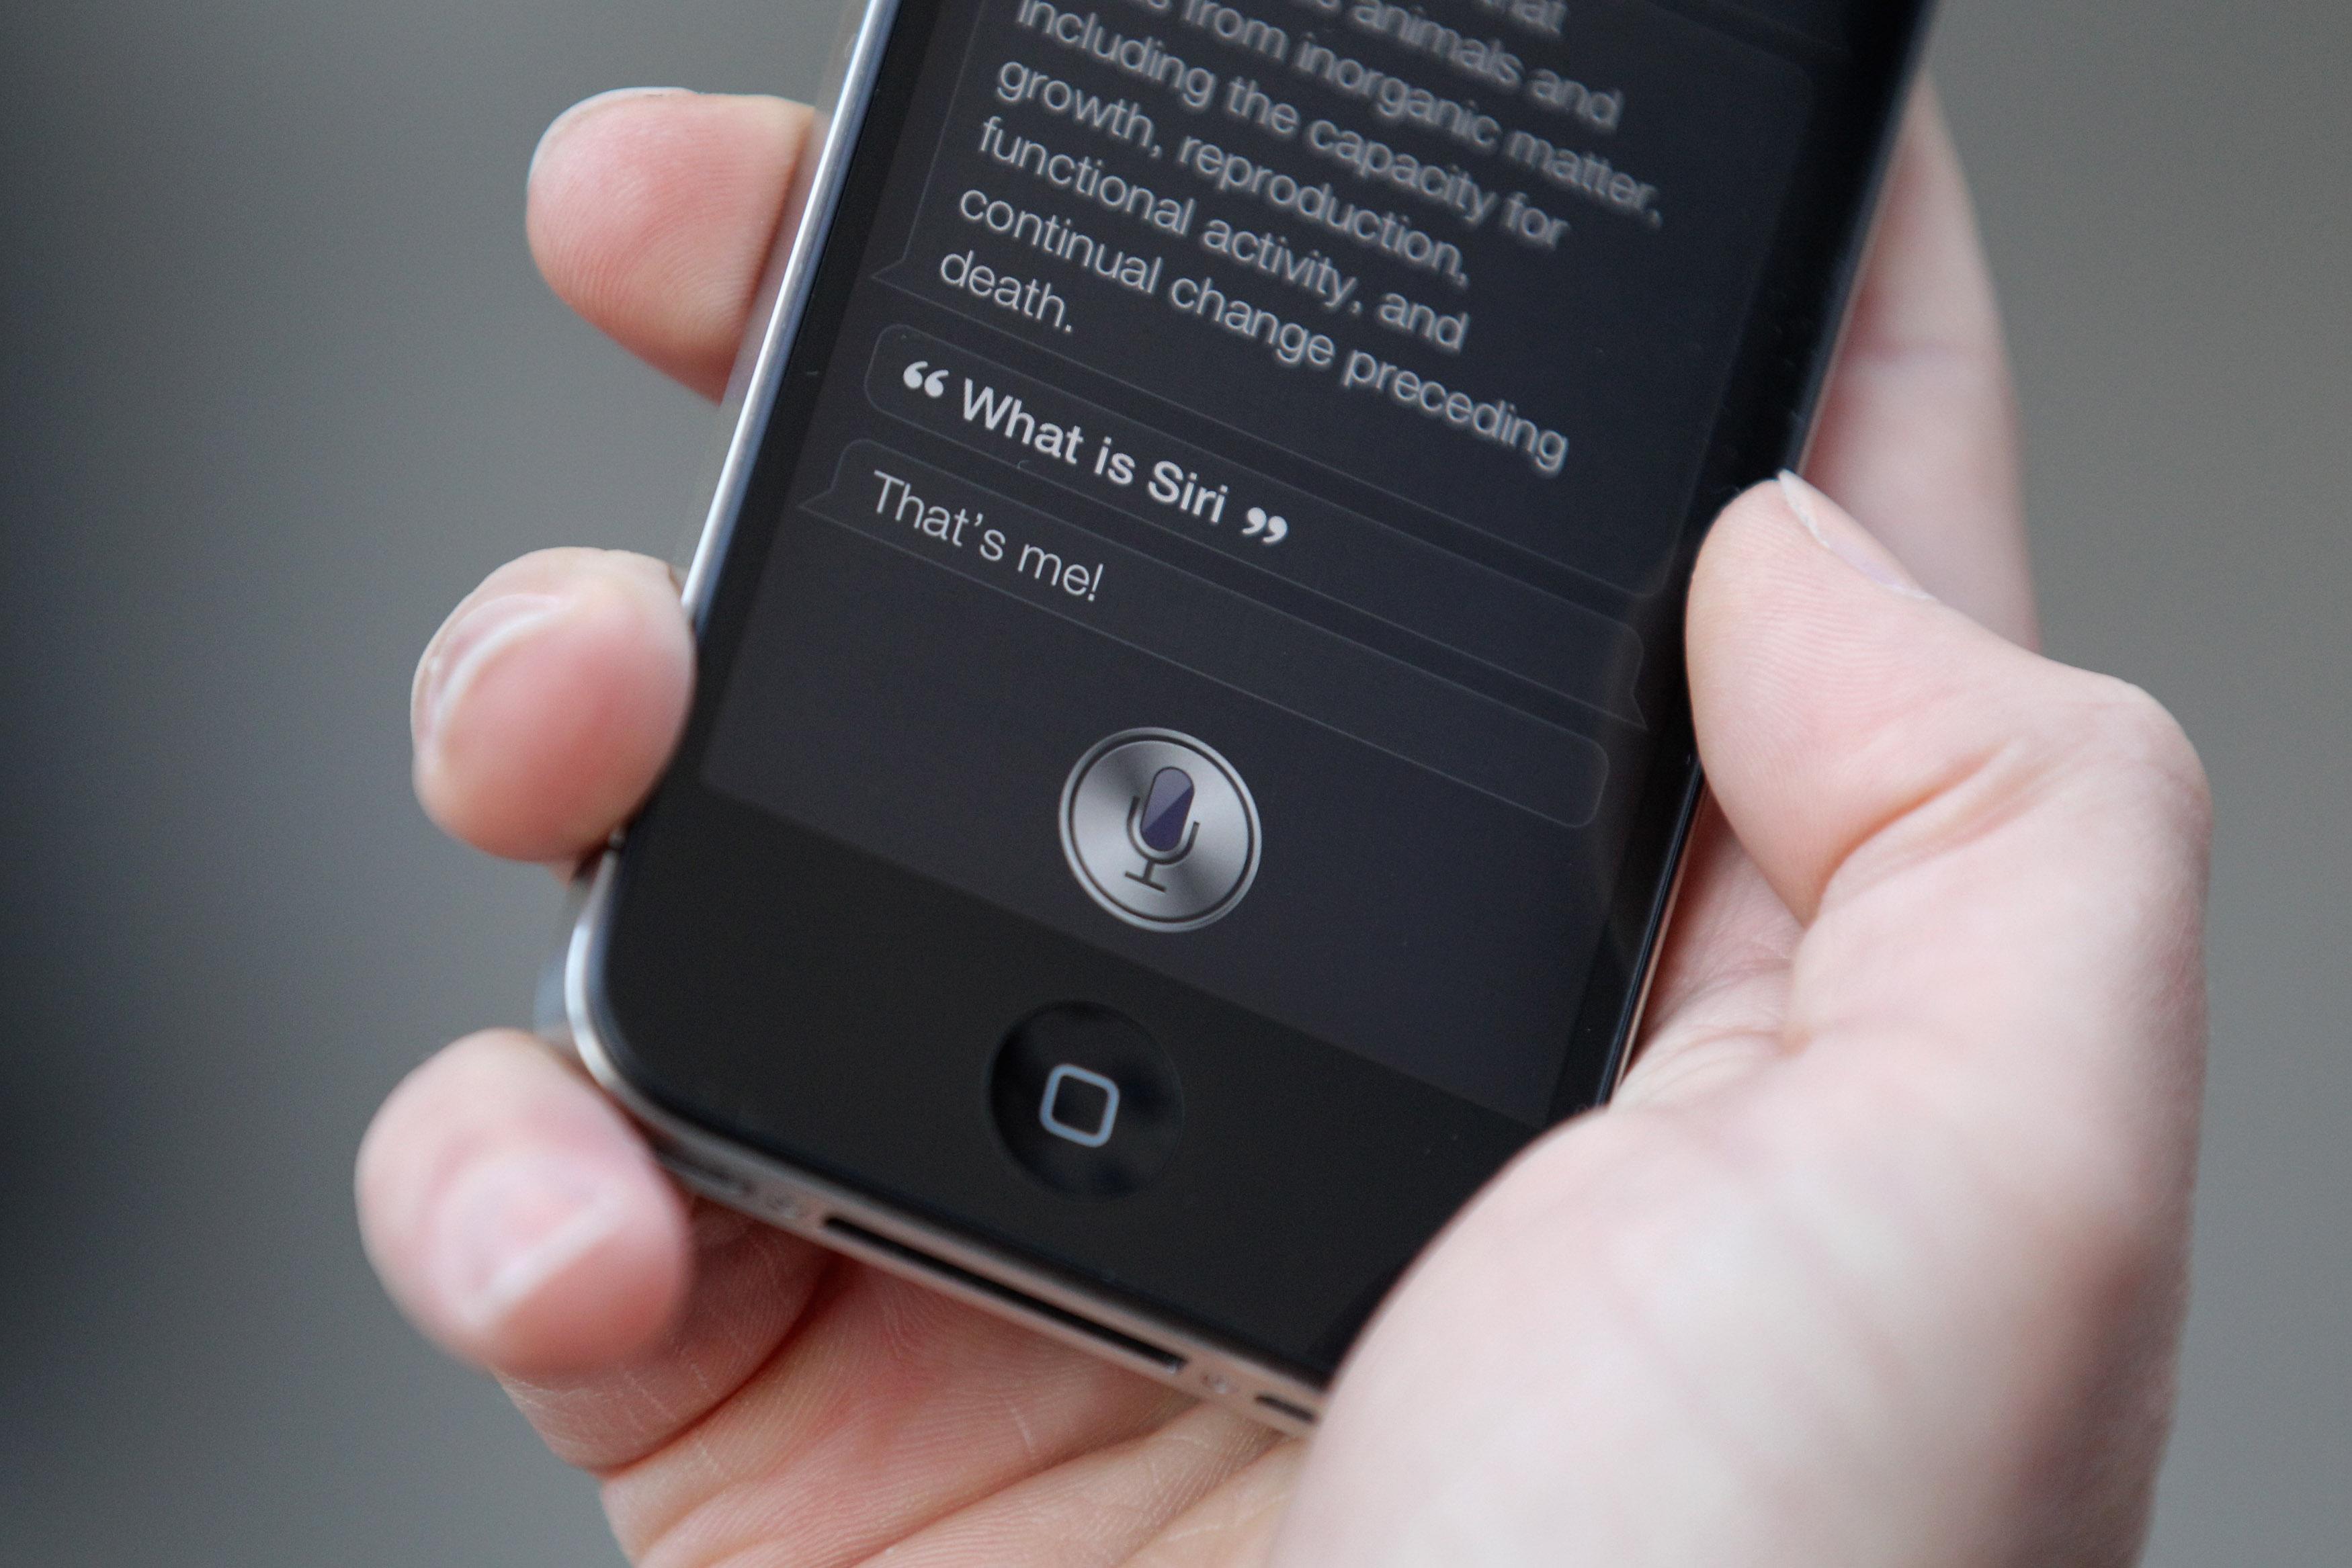 Apple iPhone 4S with Siri